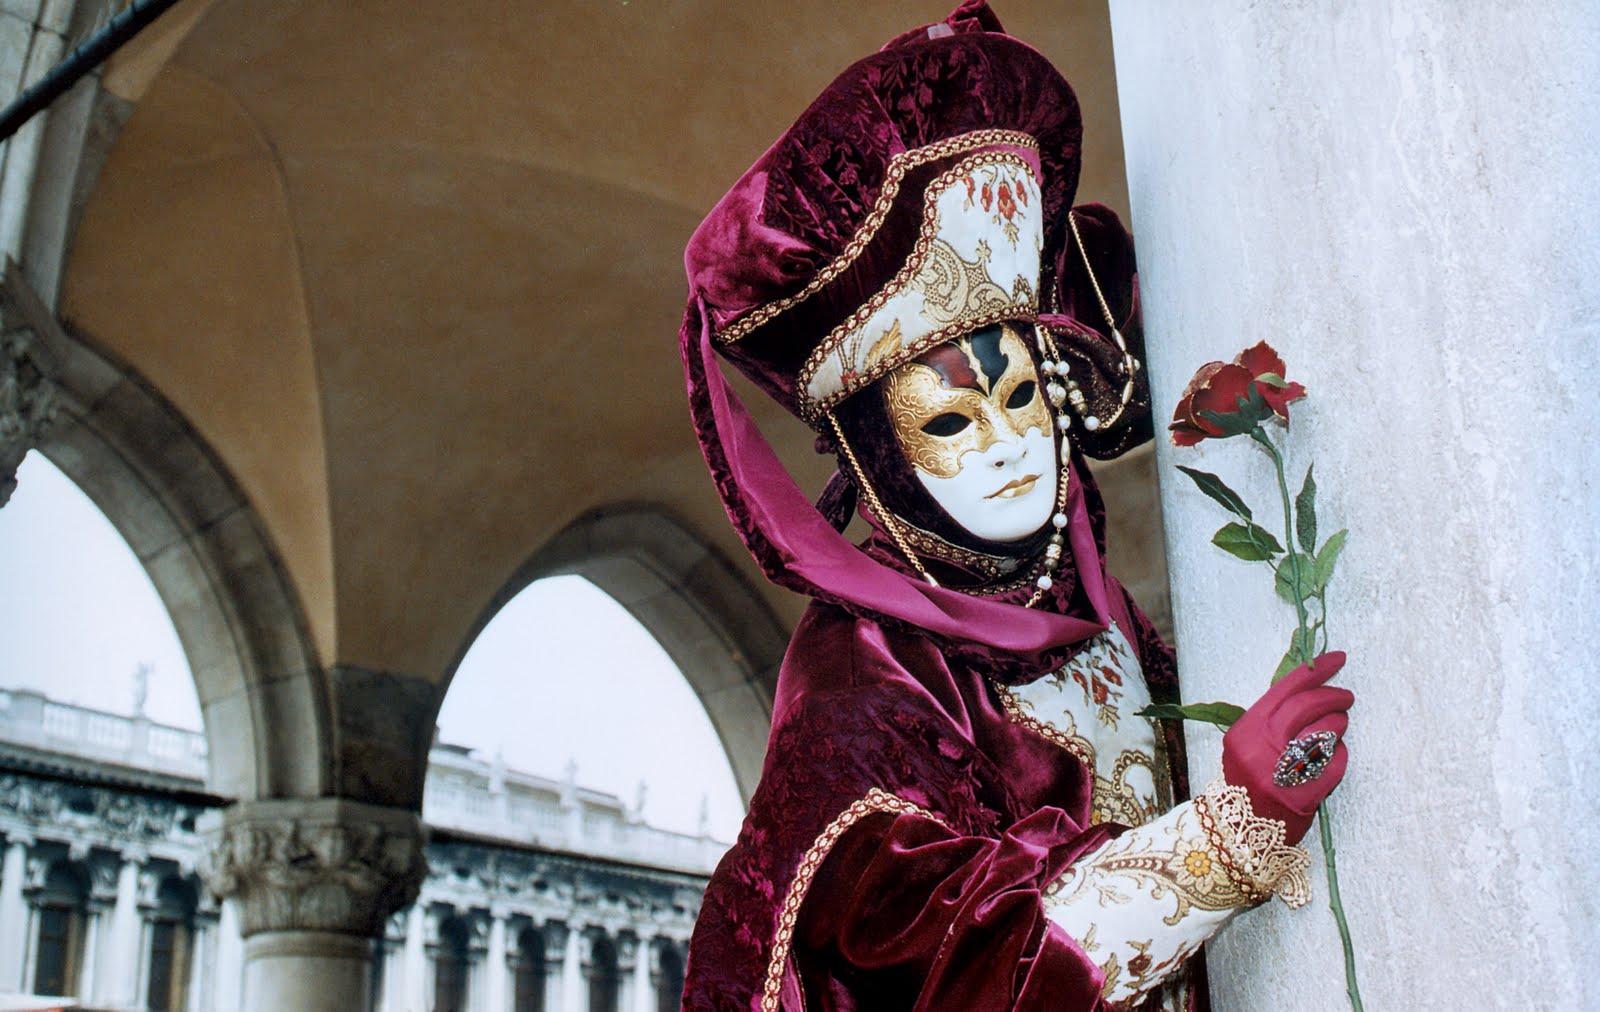 Carnaval venecia venecian mask victorian gala m scara - Mascaras de carnaval de venecia ...